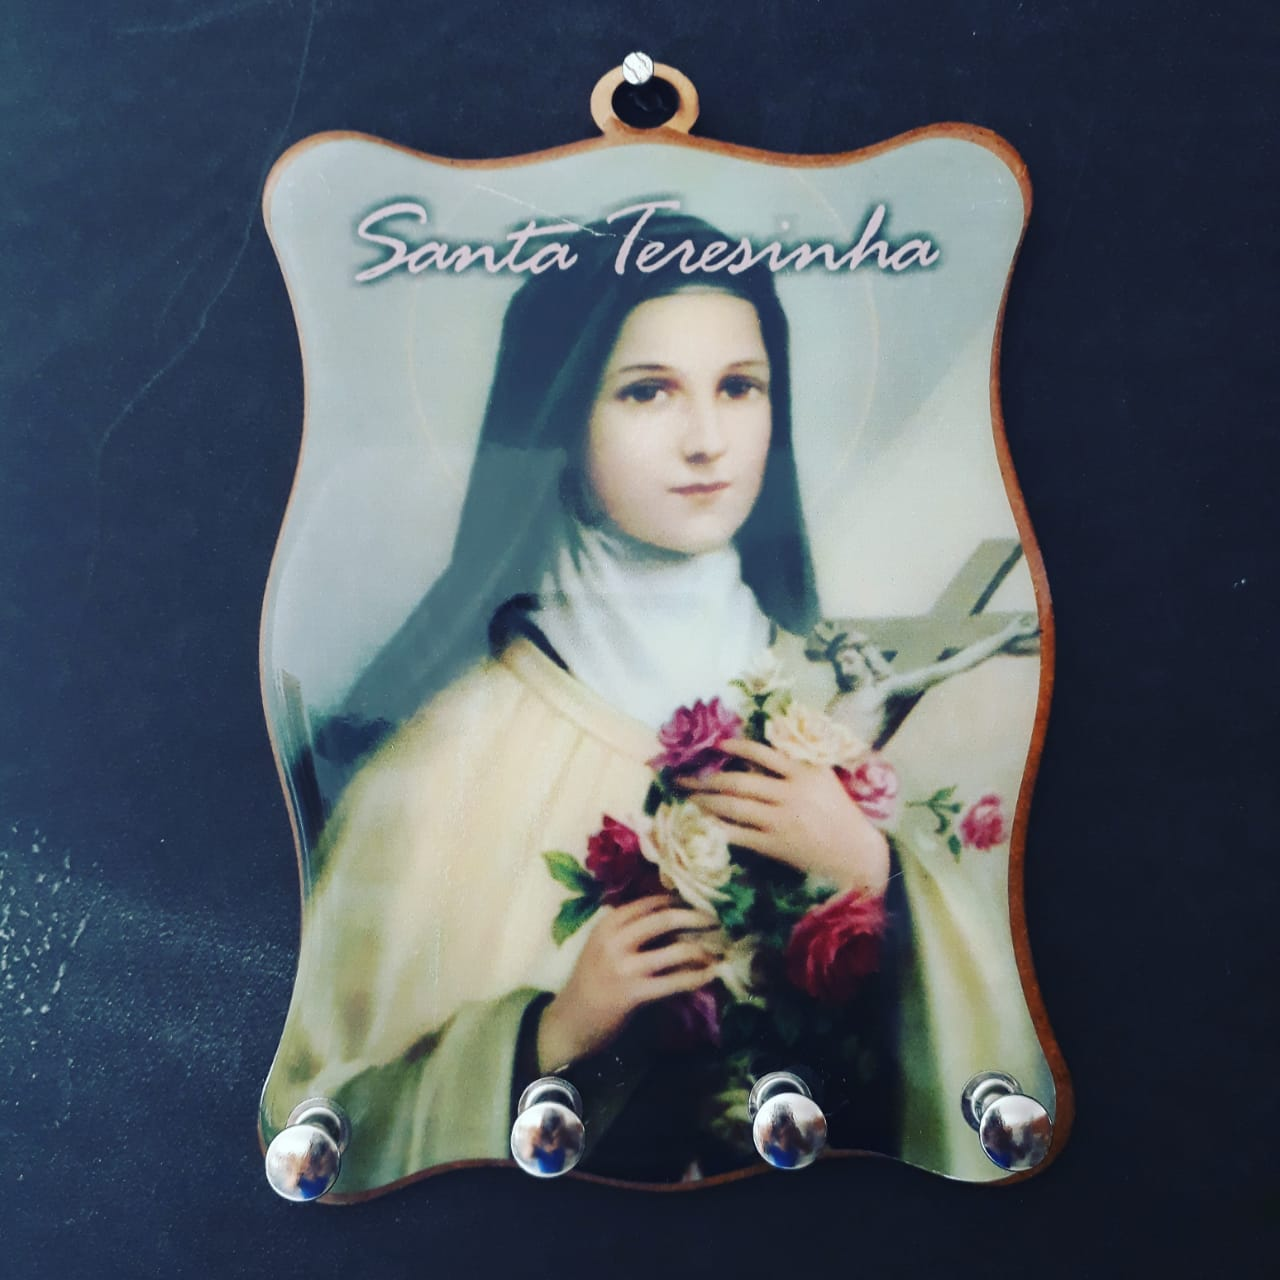 WE137 - Porta Chave 12X15cm Santa Teresinha do Menino Jesus  - VindVedShop - Distribuidora Catolica